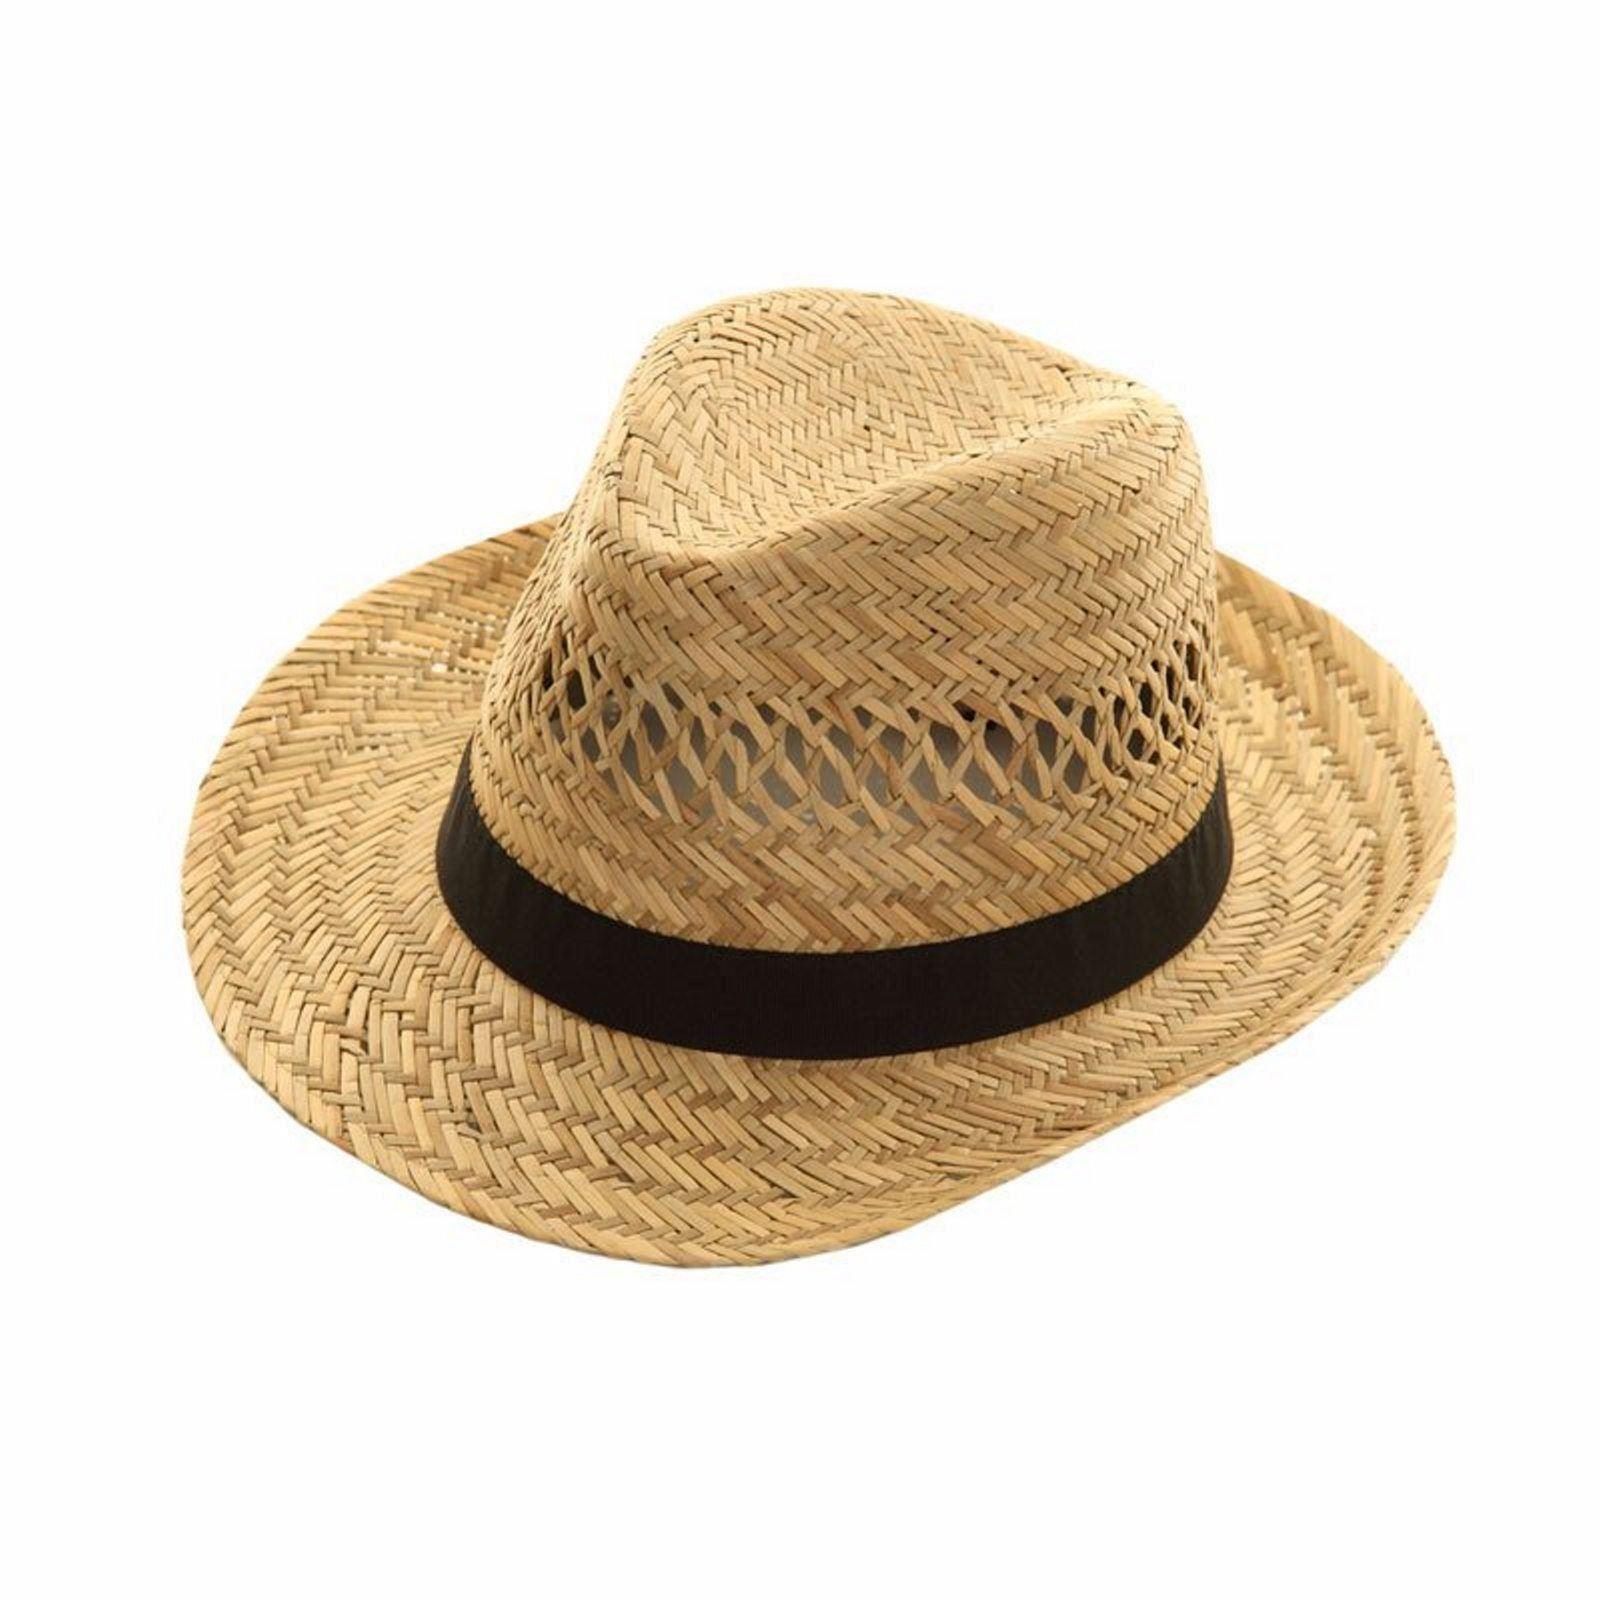 mens womens straw hat trilby fedora cap panama beach summer beachwear sun hat ebay. Black Bedroom Furniture Sets. Home Design Ideas